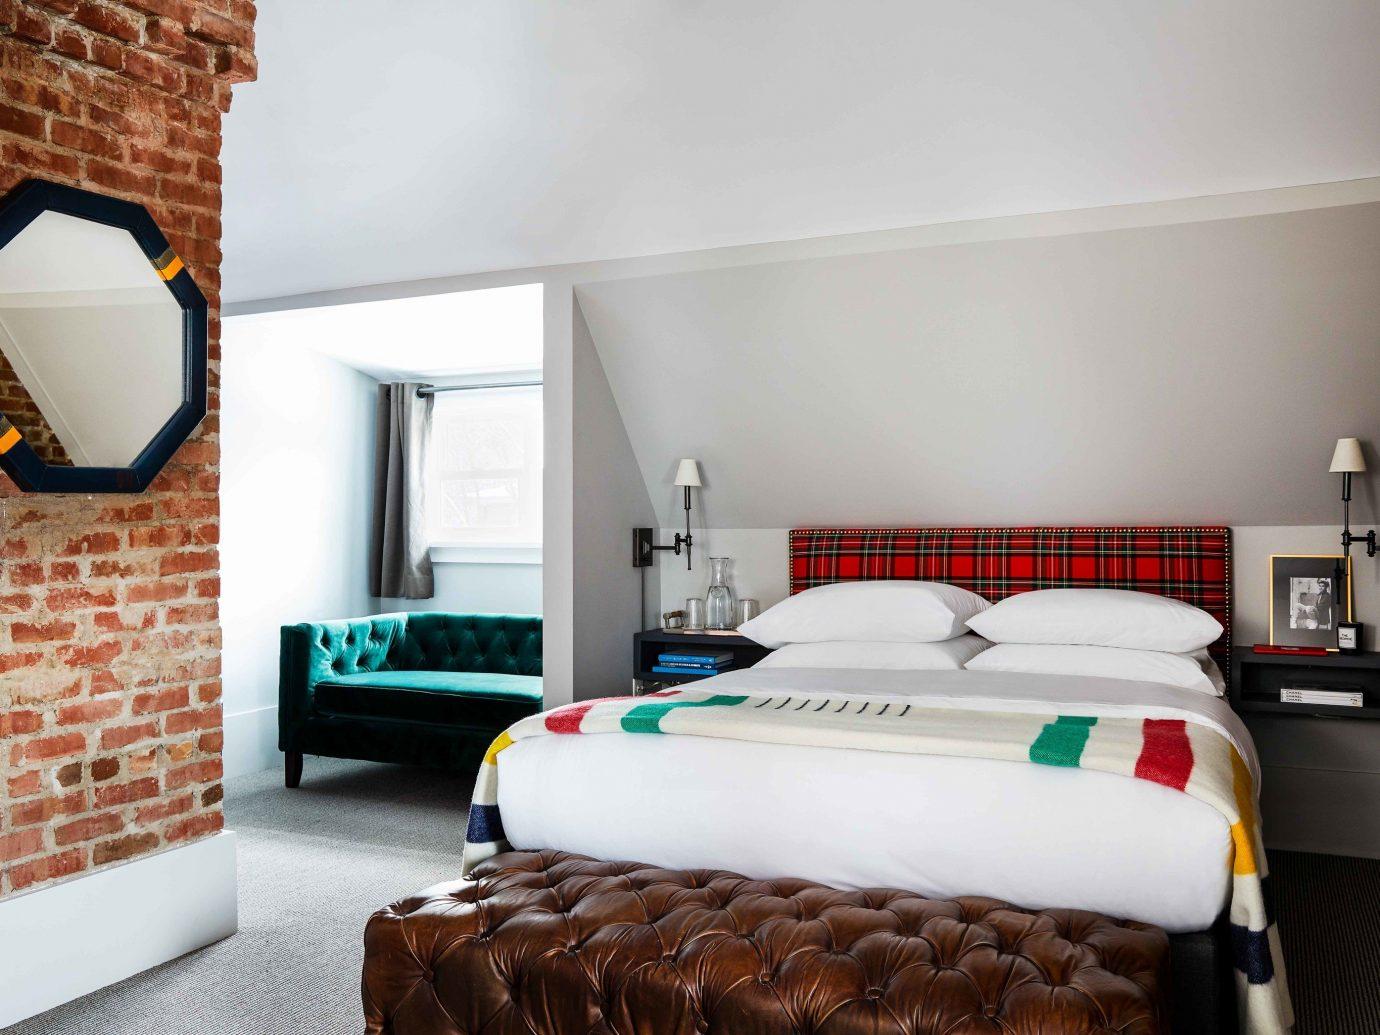 Boutique Hotels Hotels Influencers + Tastemakers Romantic Hotels Style + Design wall indoor room Suite interior design bed frame Bedroom ceiling real estate white hotel floor furniture